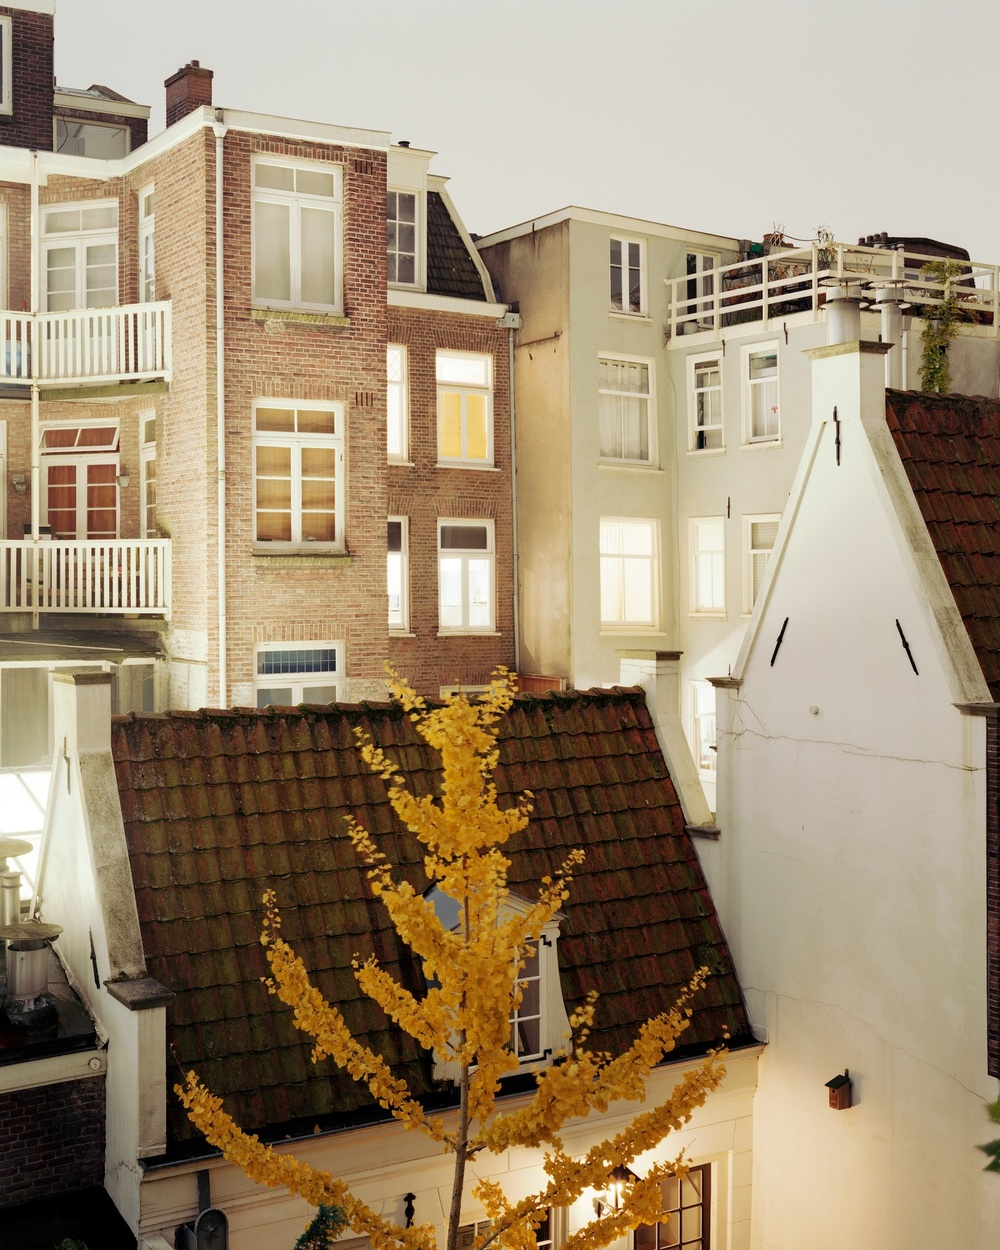 Rear Window Amsterdam #1, Jordi Huisman